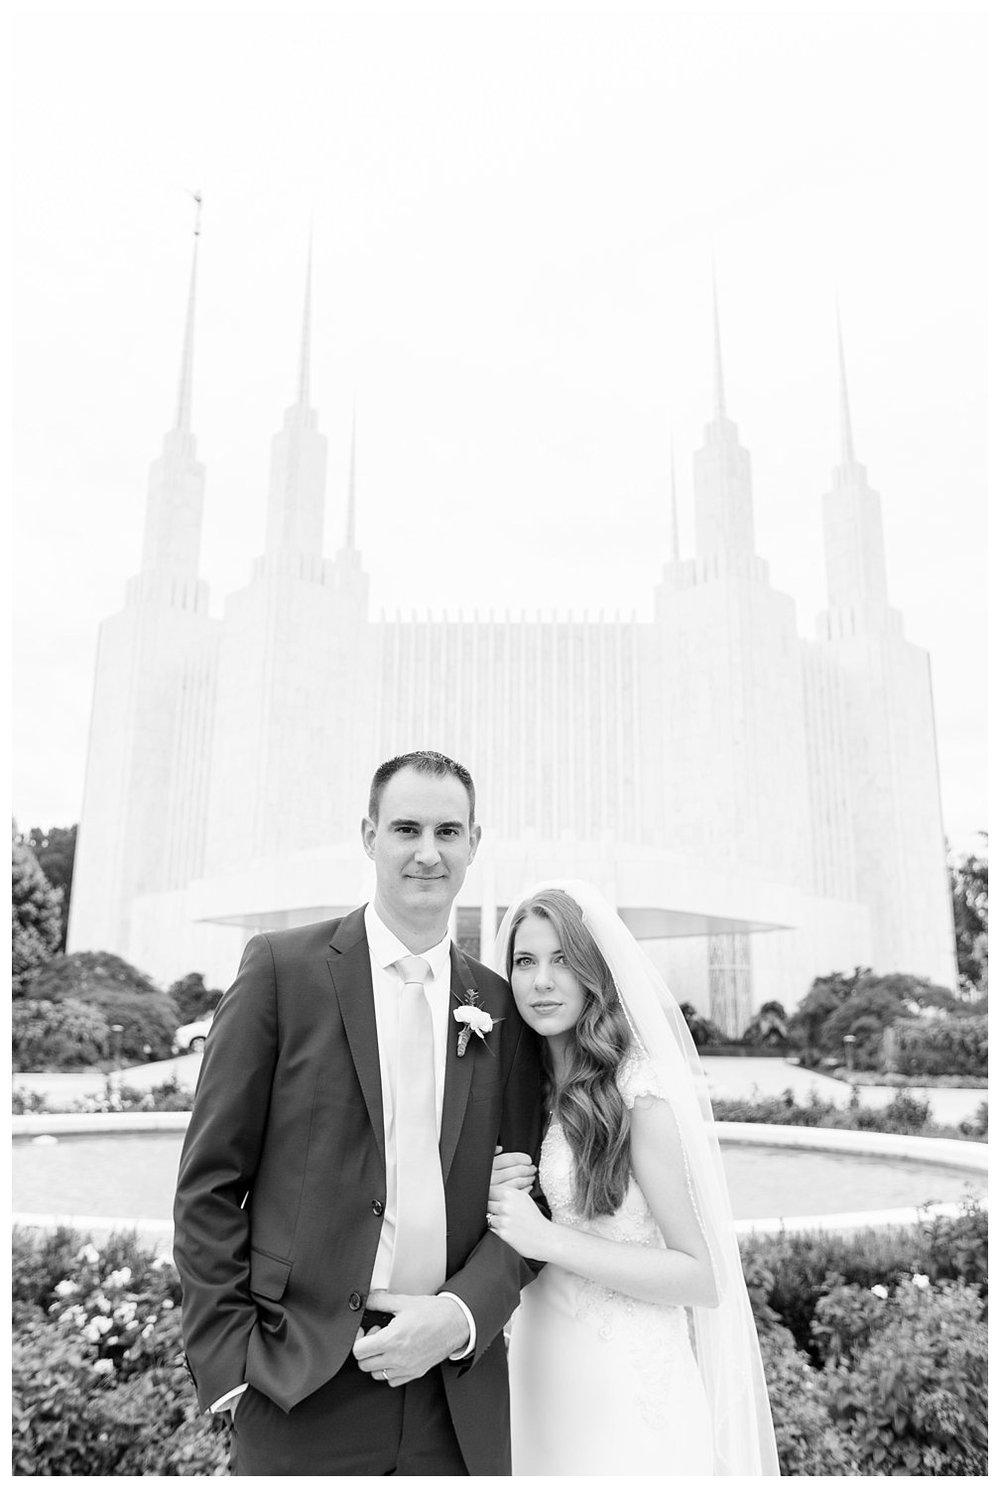 elovephotos Washington DC LDS Temple Photographer_0873.jpg